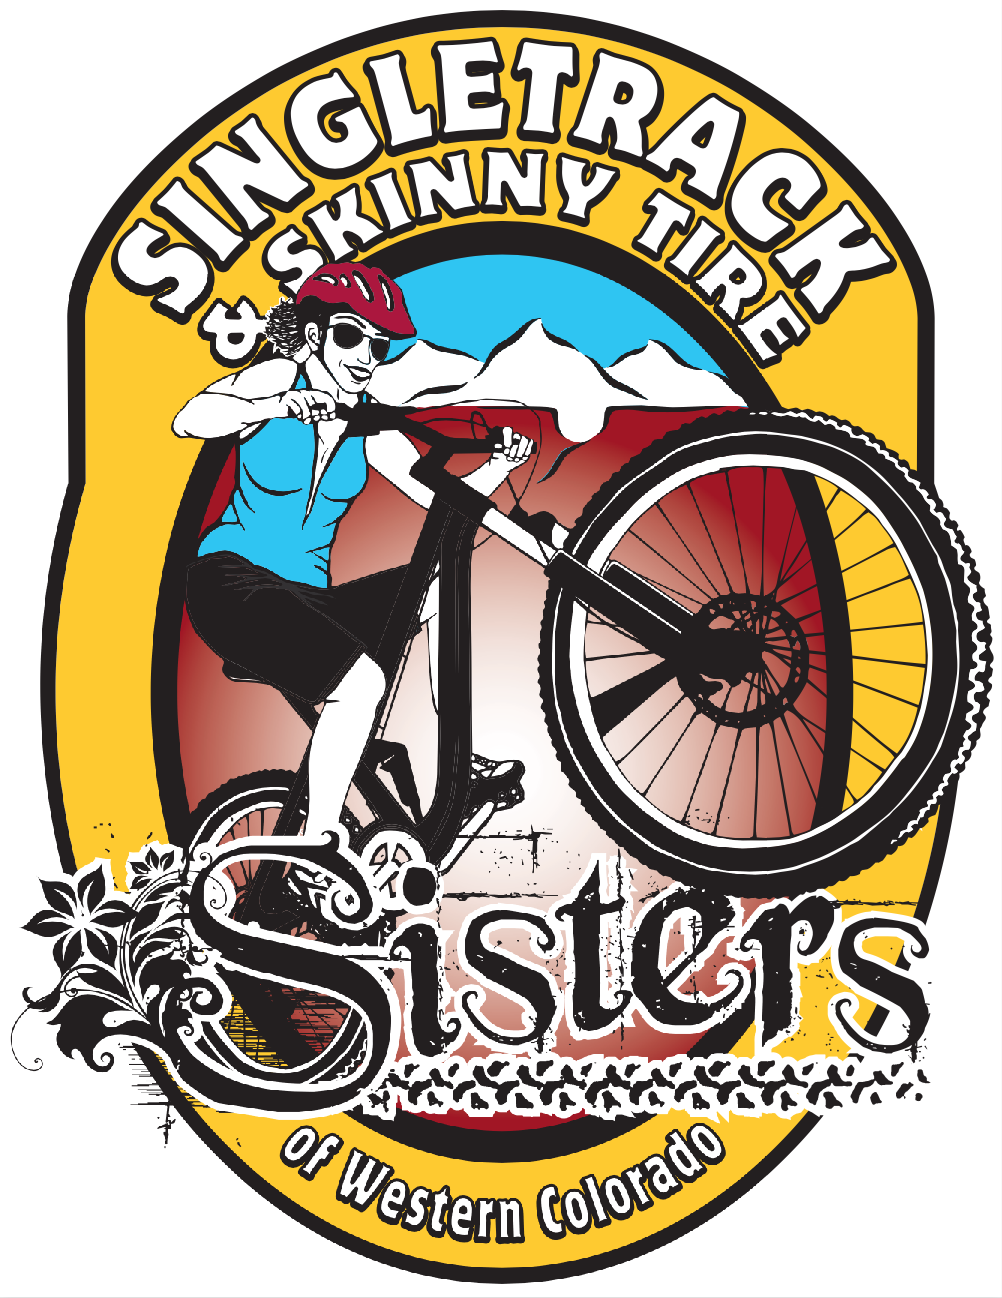 Single Track & Skinny Tire Sisters